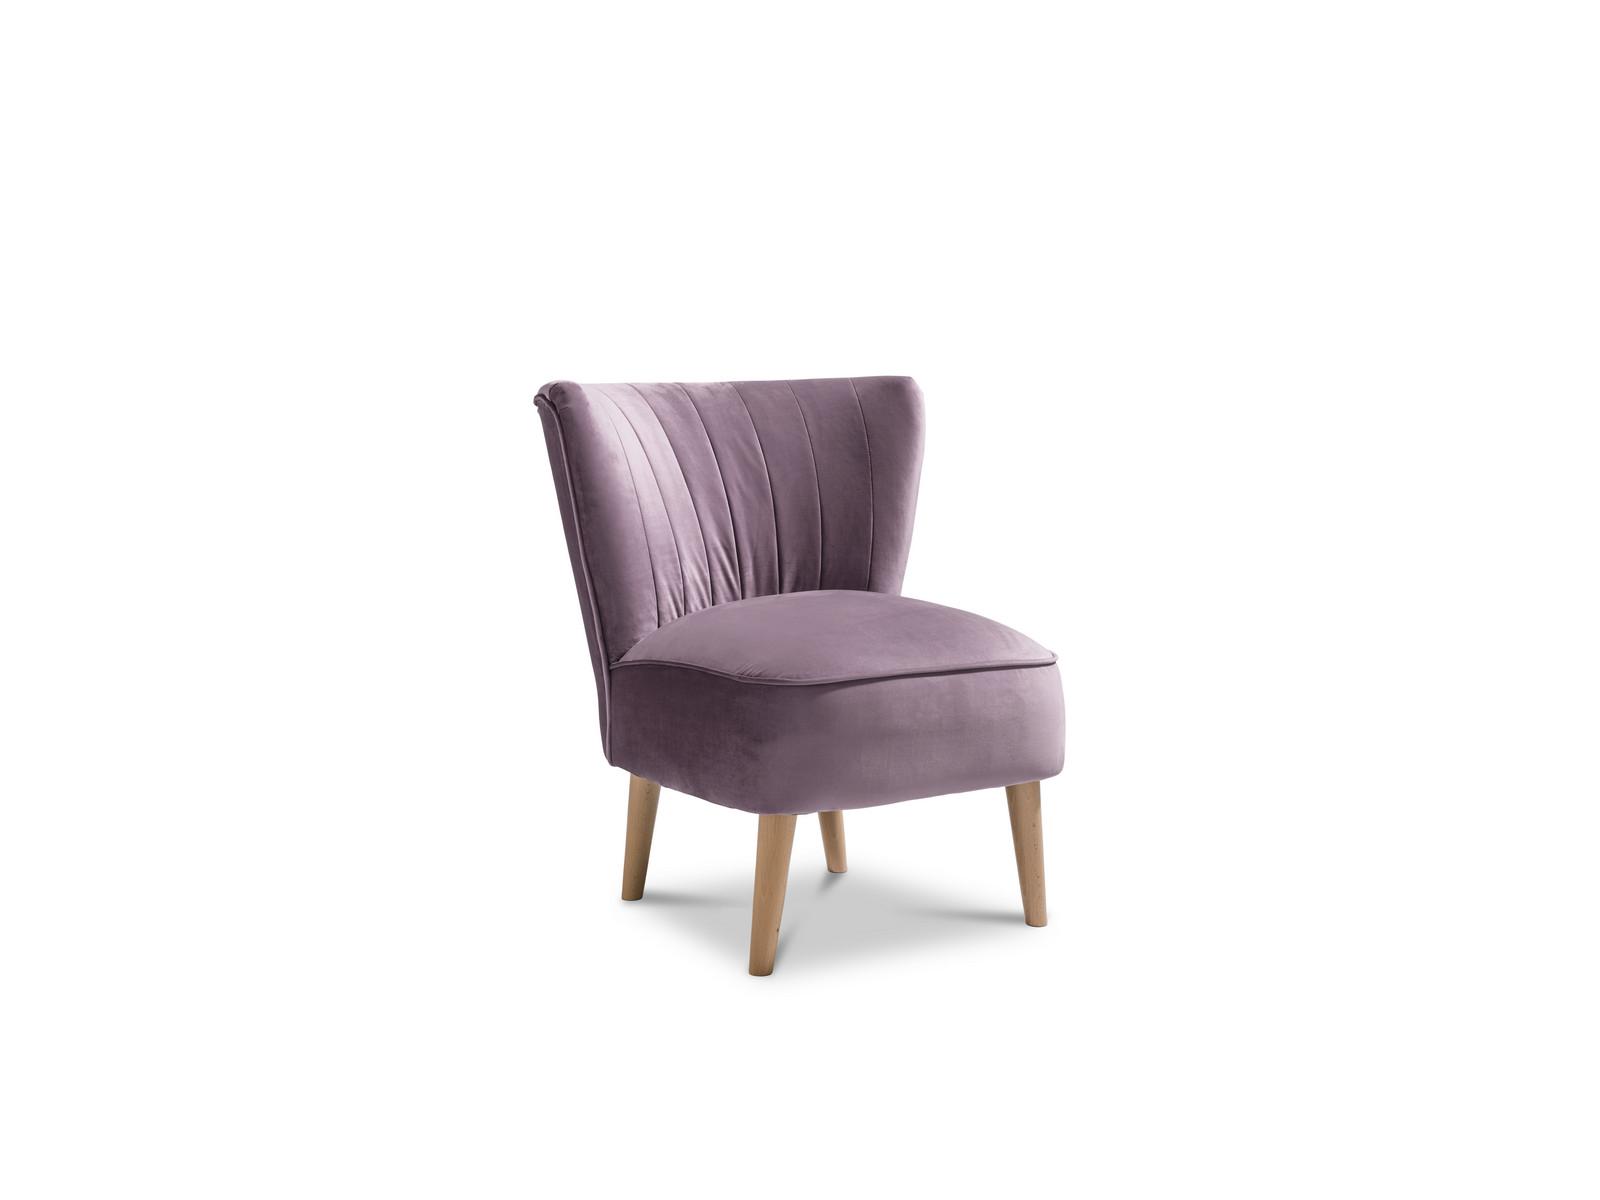 Malmesbury Accent Chair Plush Lilac Light Legs Fabric Armchair 5055641339922 Ebay